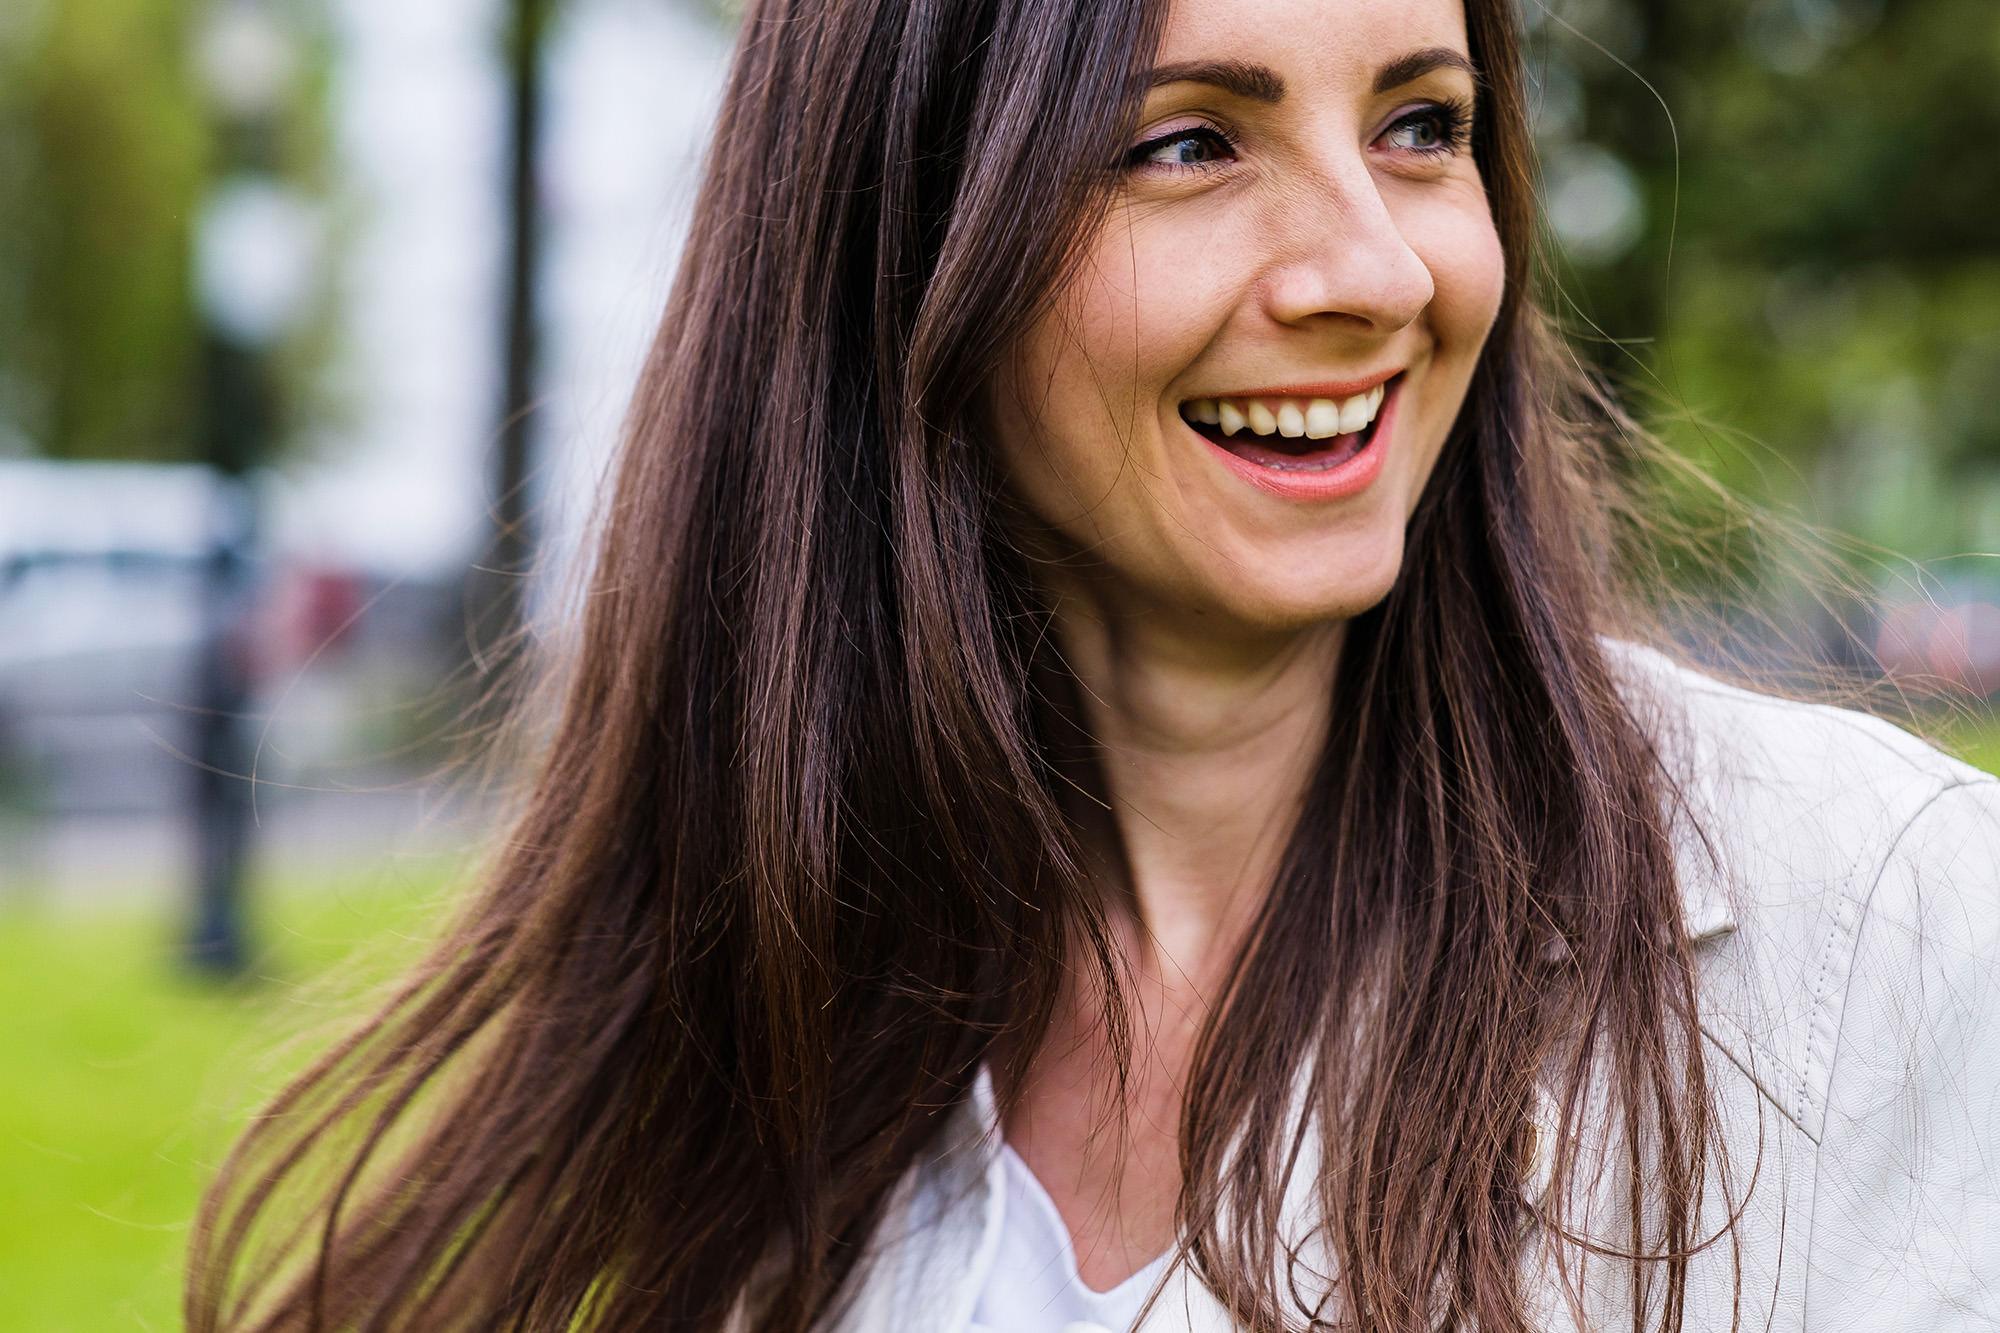 smiling woman Brighton